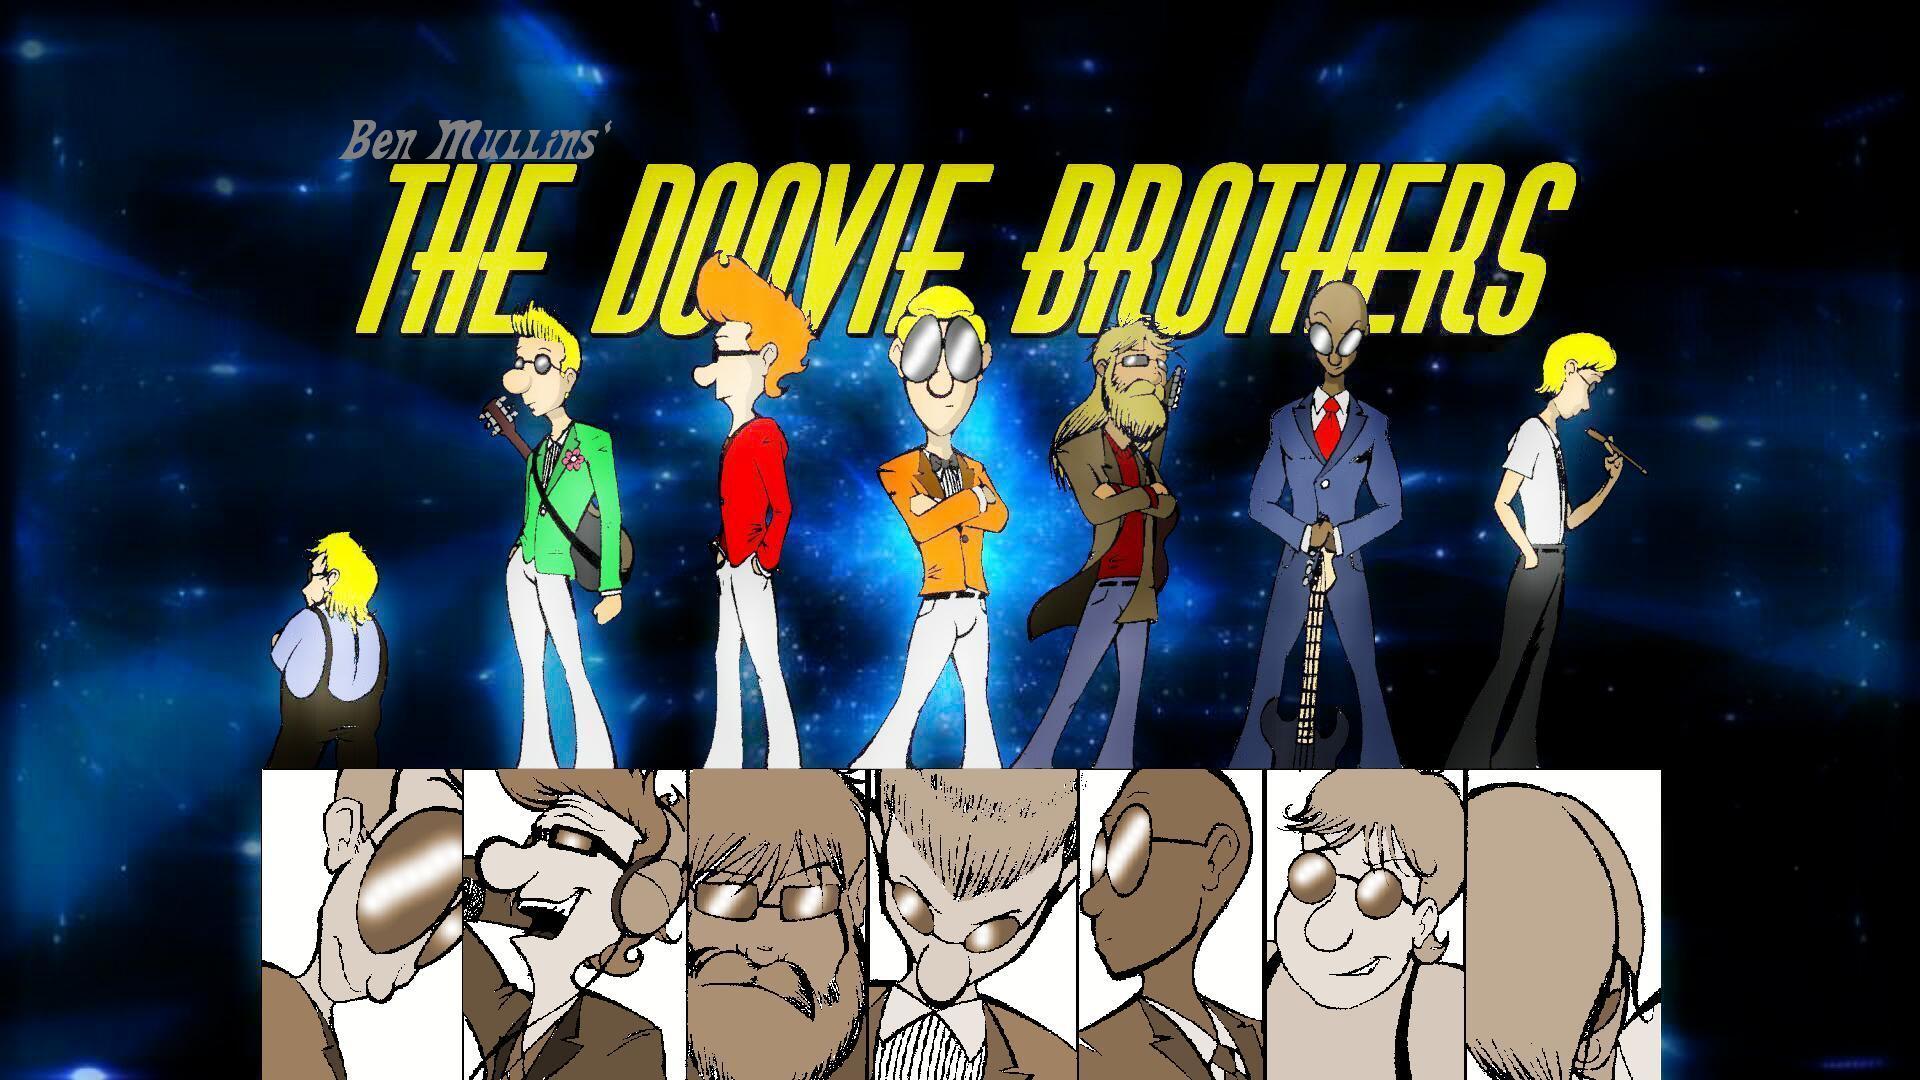 The Doovie Bros cartoon band